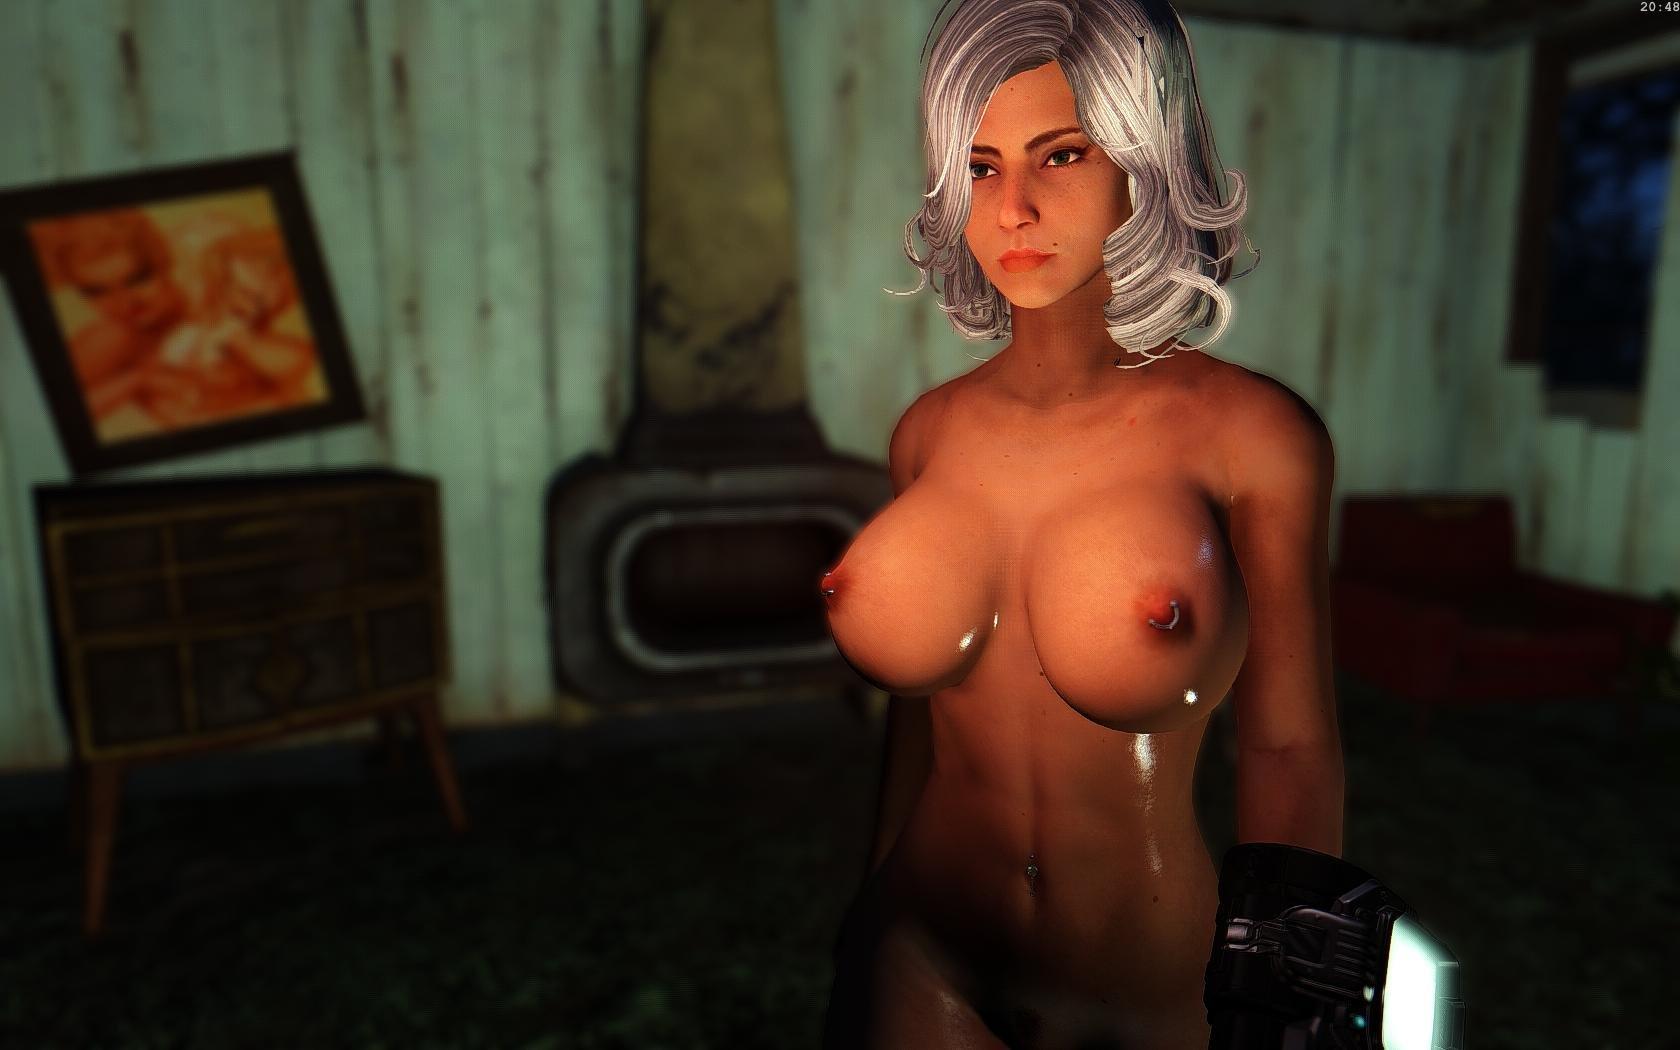 Fallout4 2018-12-31 20-48-19-56